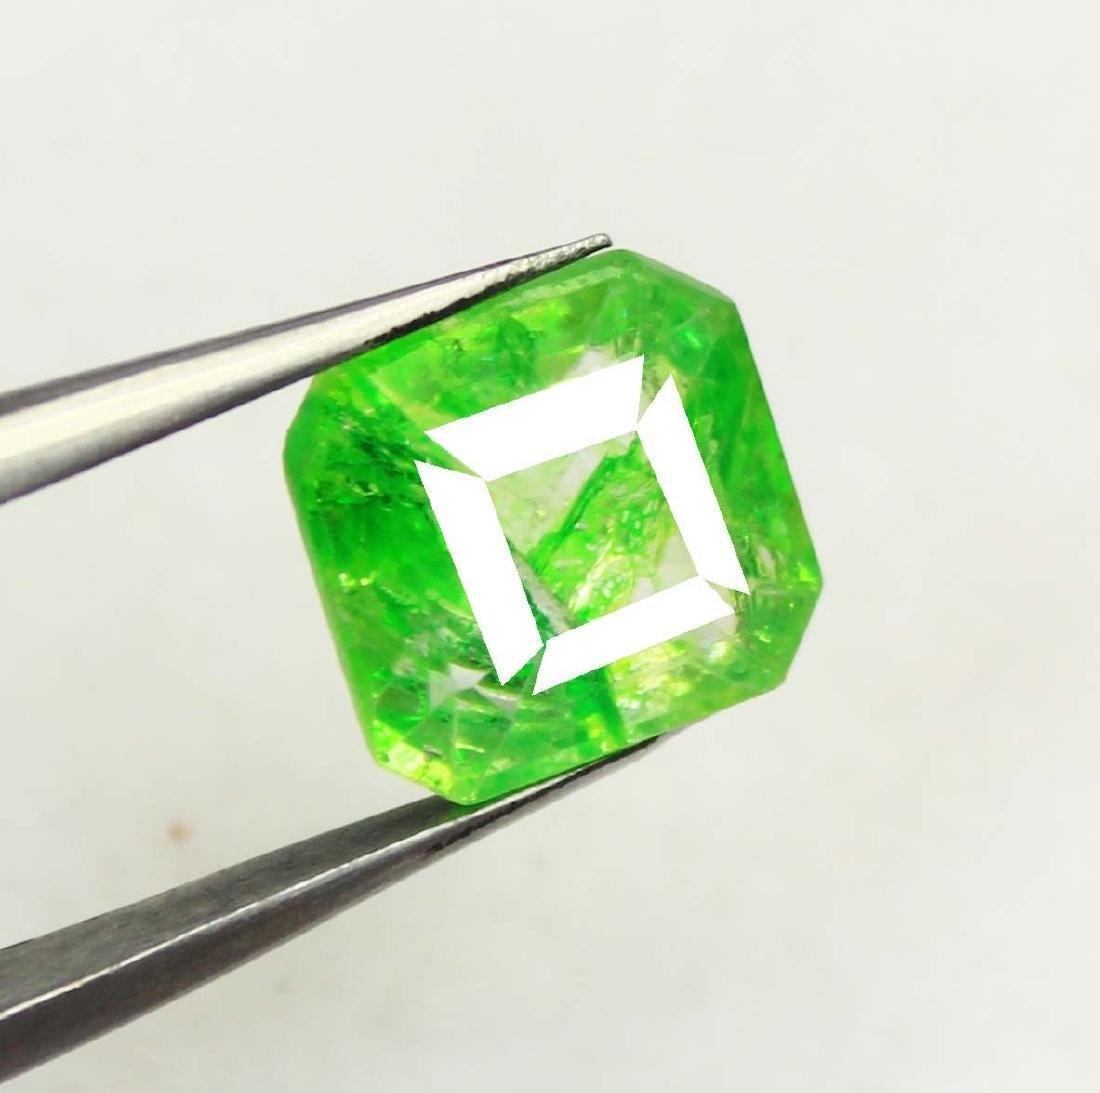 5.60Ct Wonderful Natural Green Emerald EGL Certified - 3